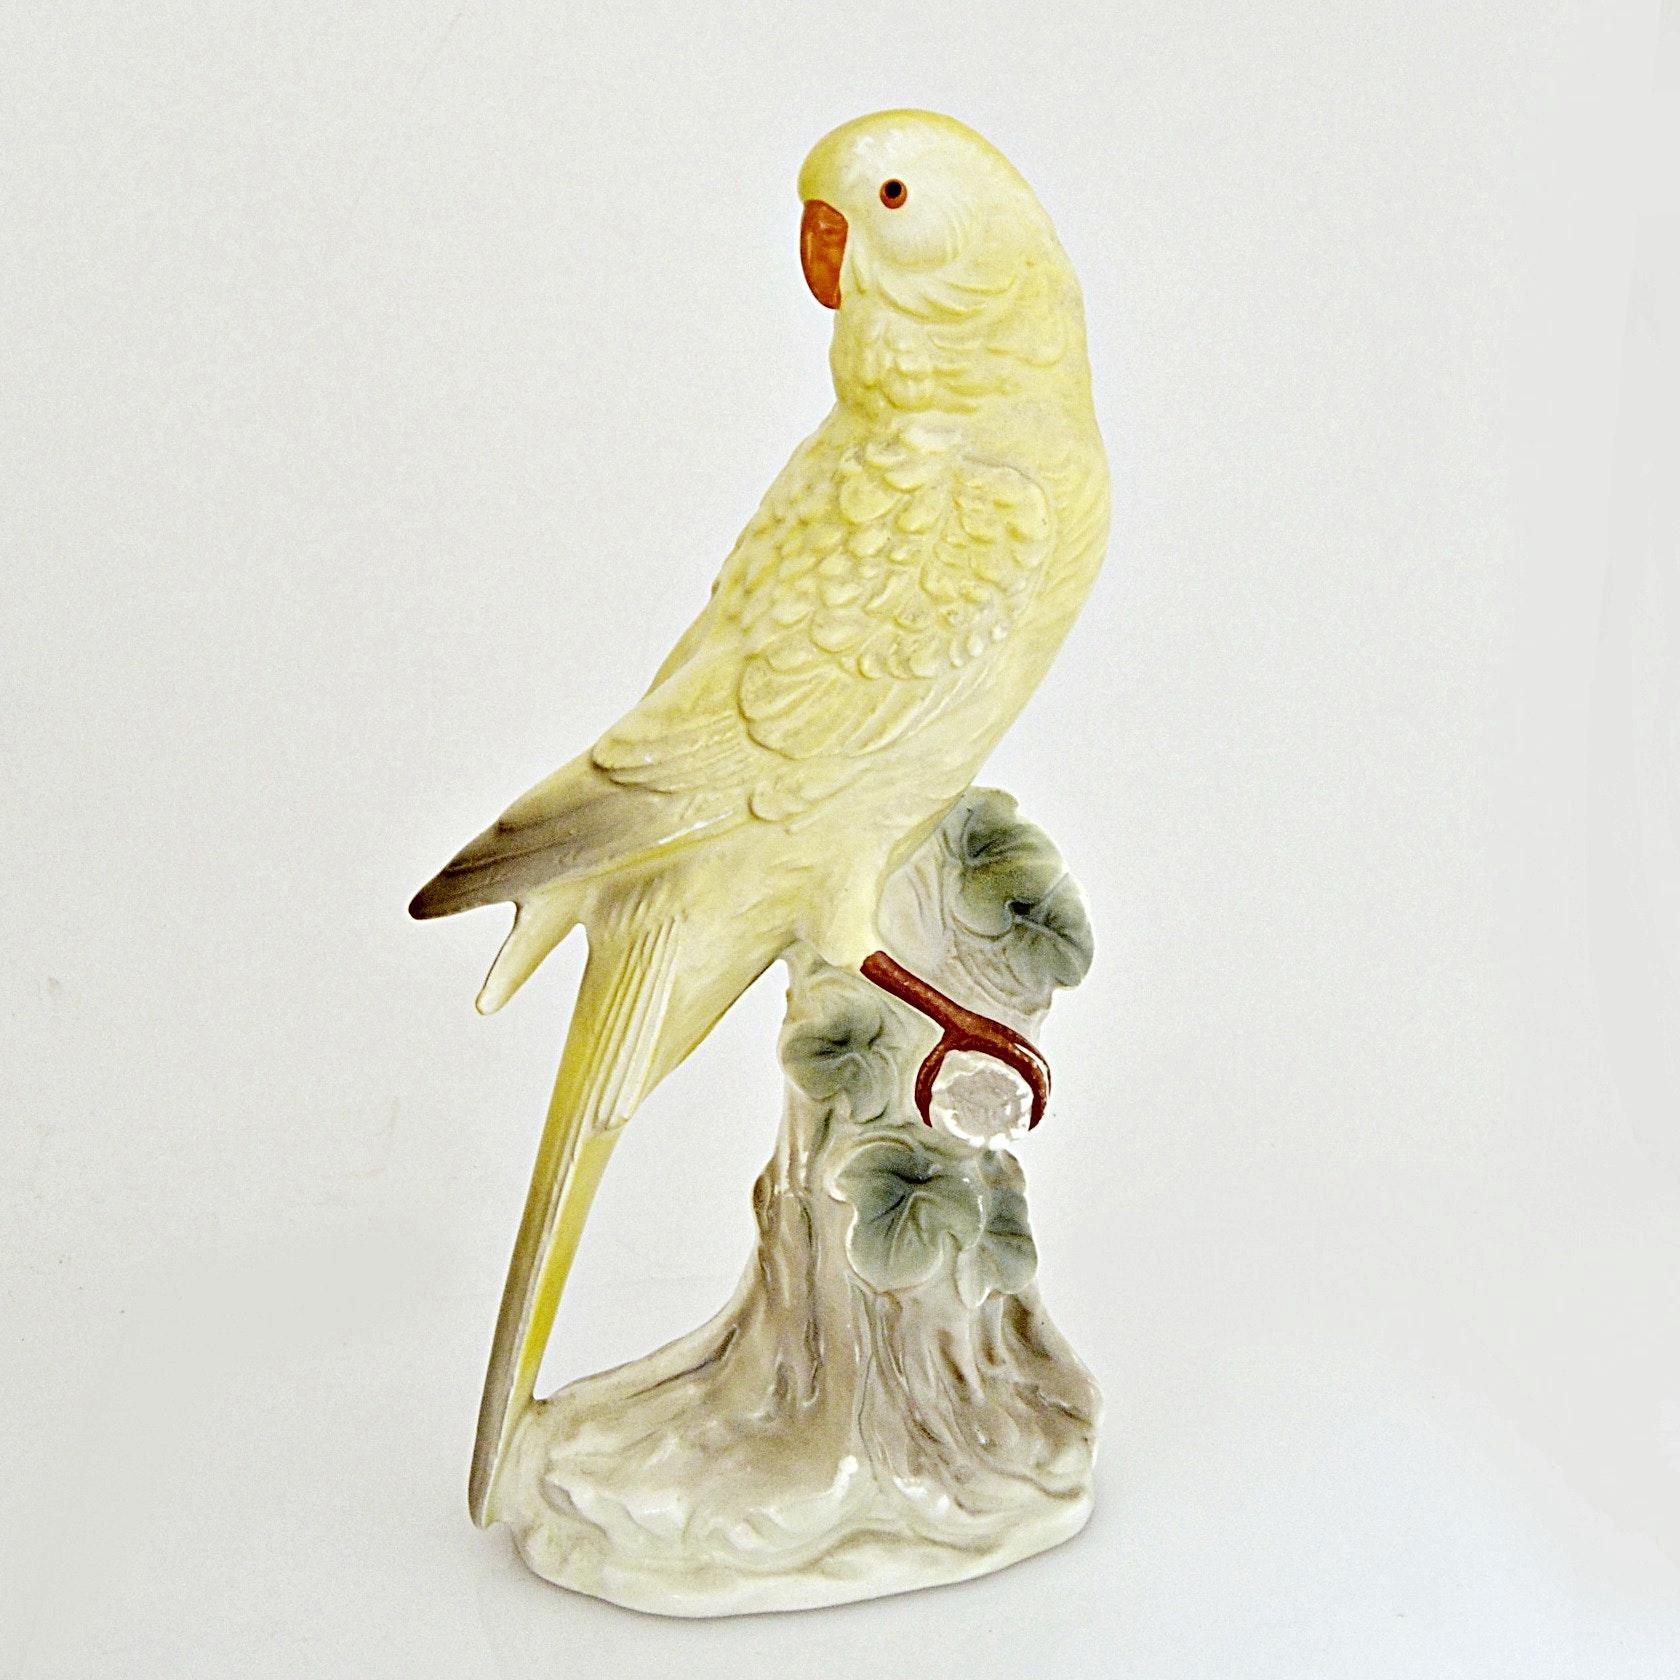 Vintage Yellow Parakeet Porcelain Figurine